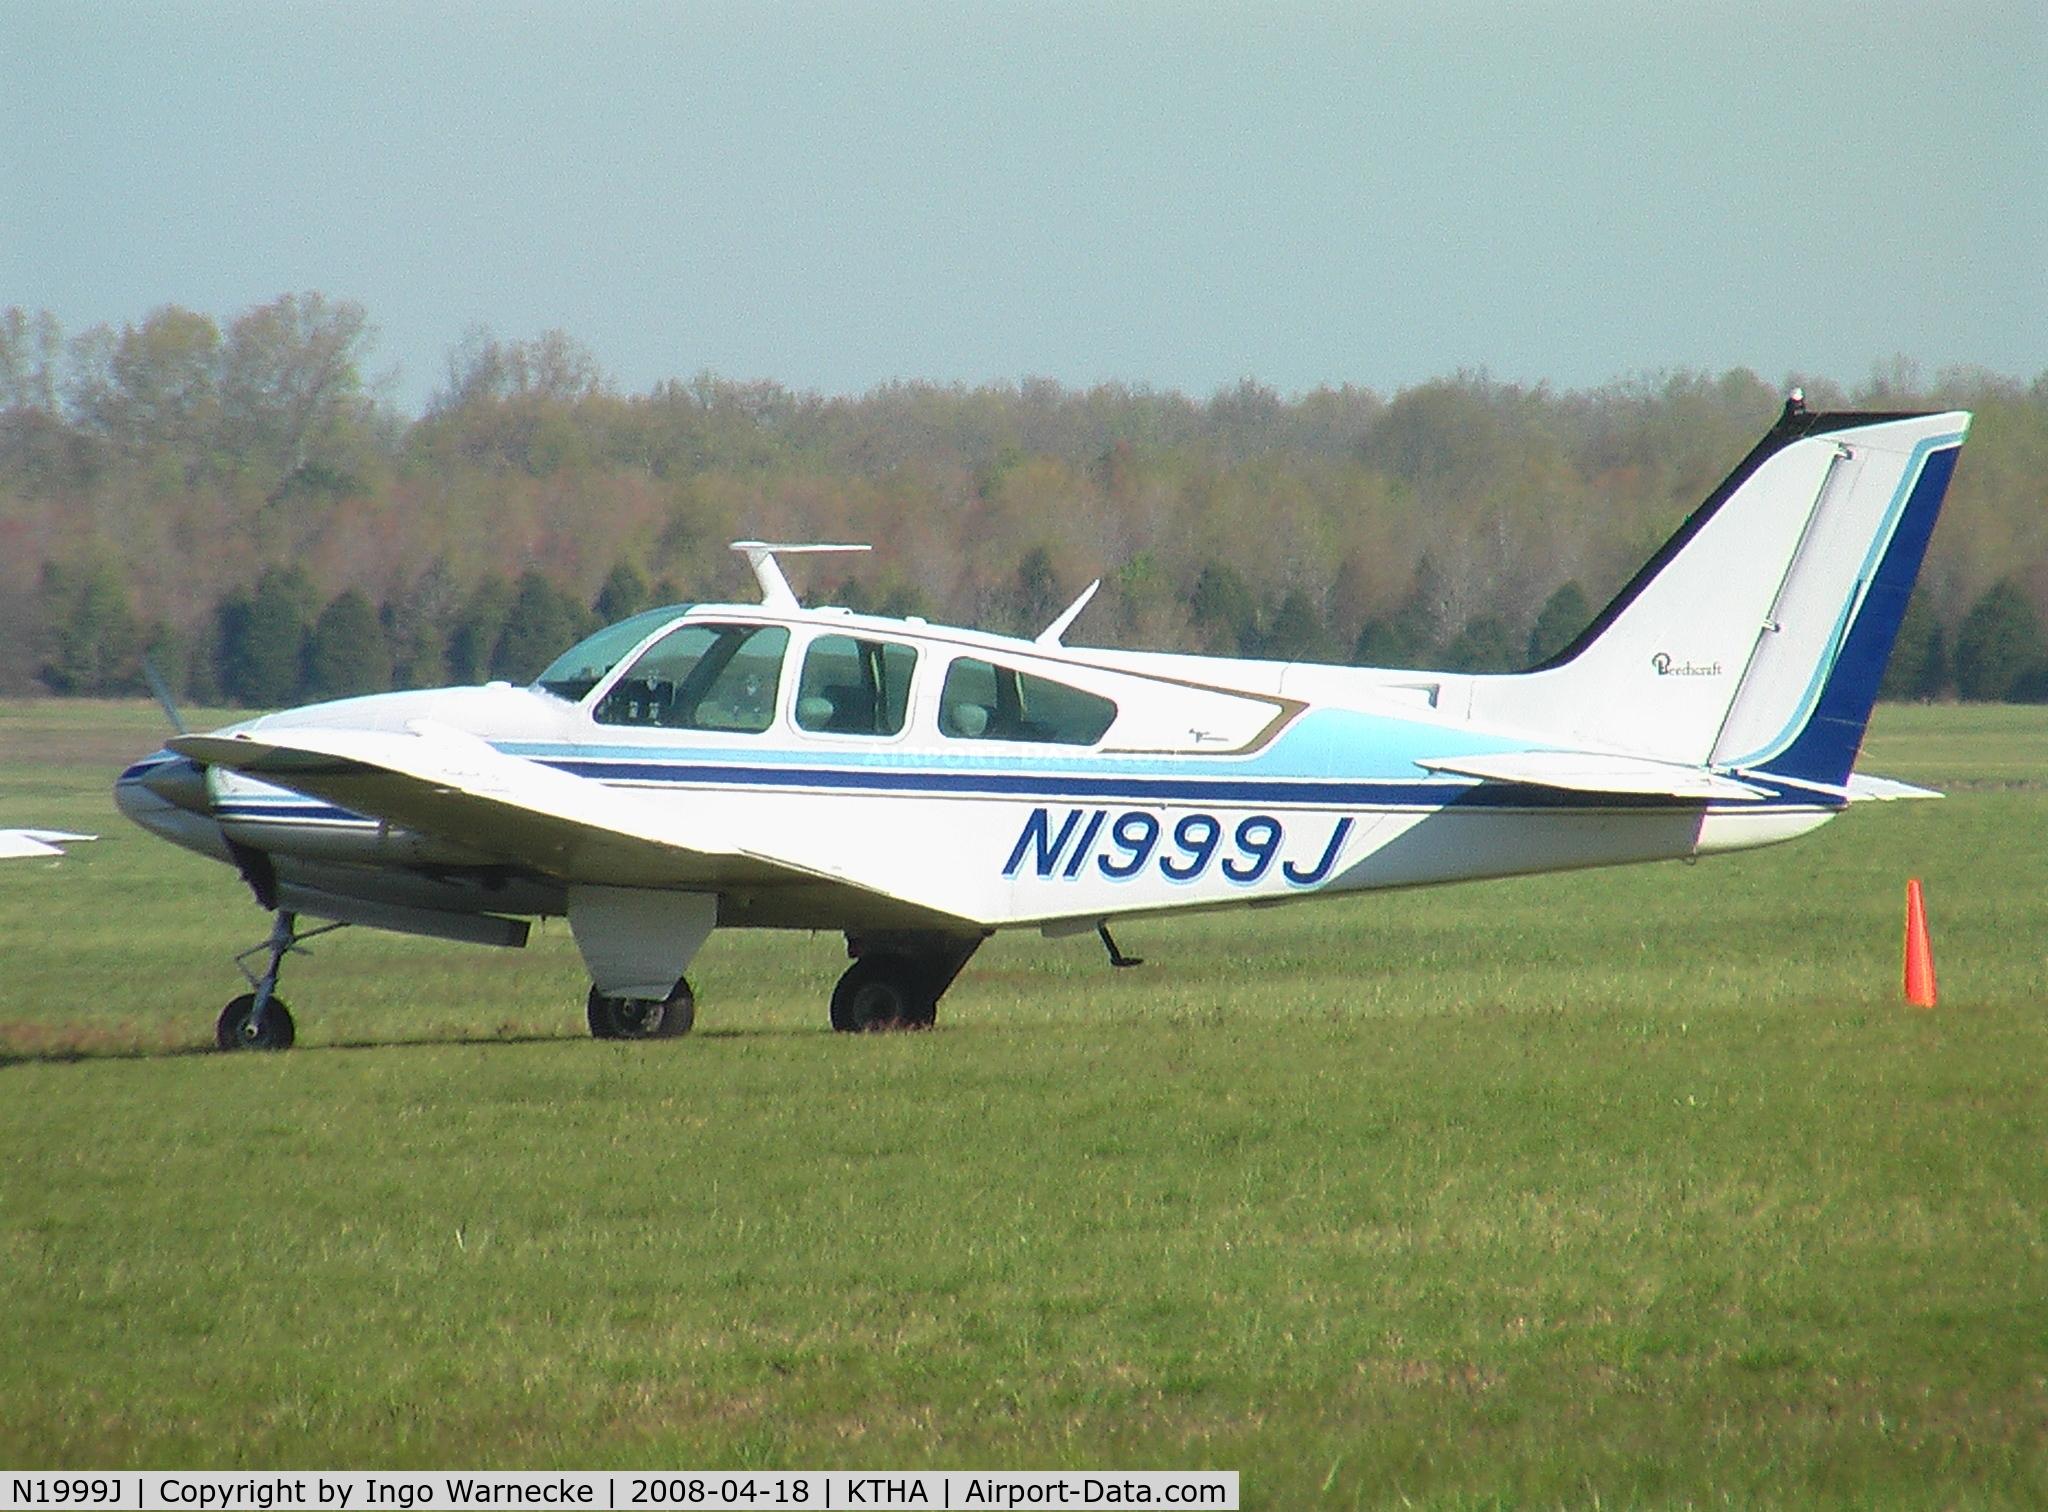 N1999J, 1967 Beech 95-C55 C/N TE-344, Beech 95-C55 Baron at Beechcraft Heritage Museum, Tullahoma Regional Airport